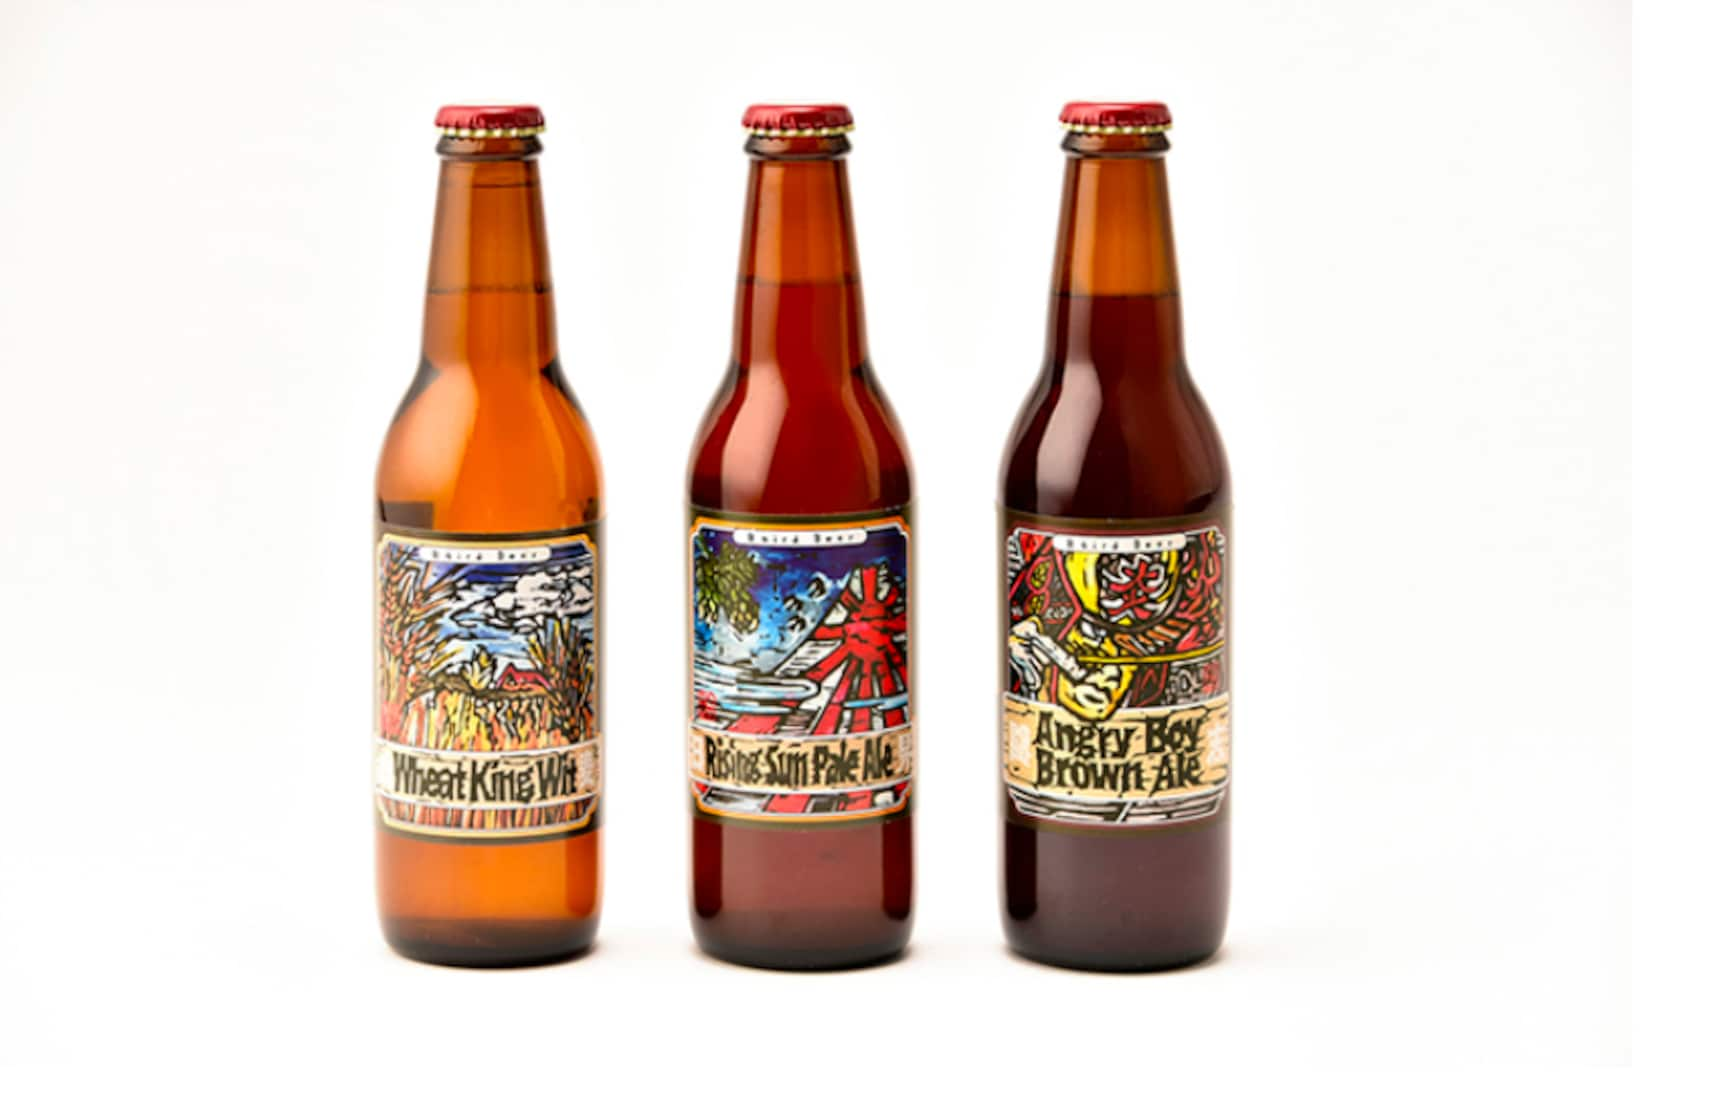 Baird Beer: A Microbrew Wonder